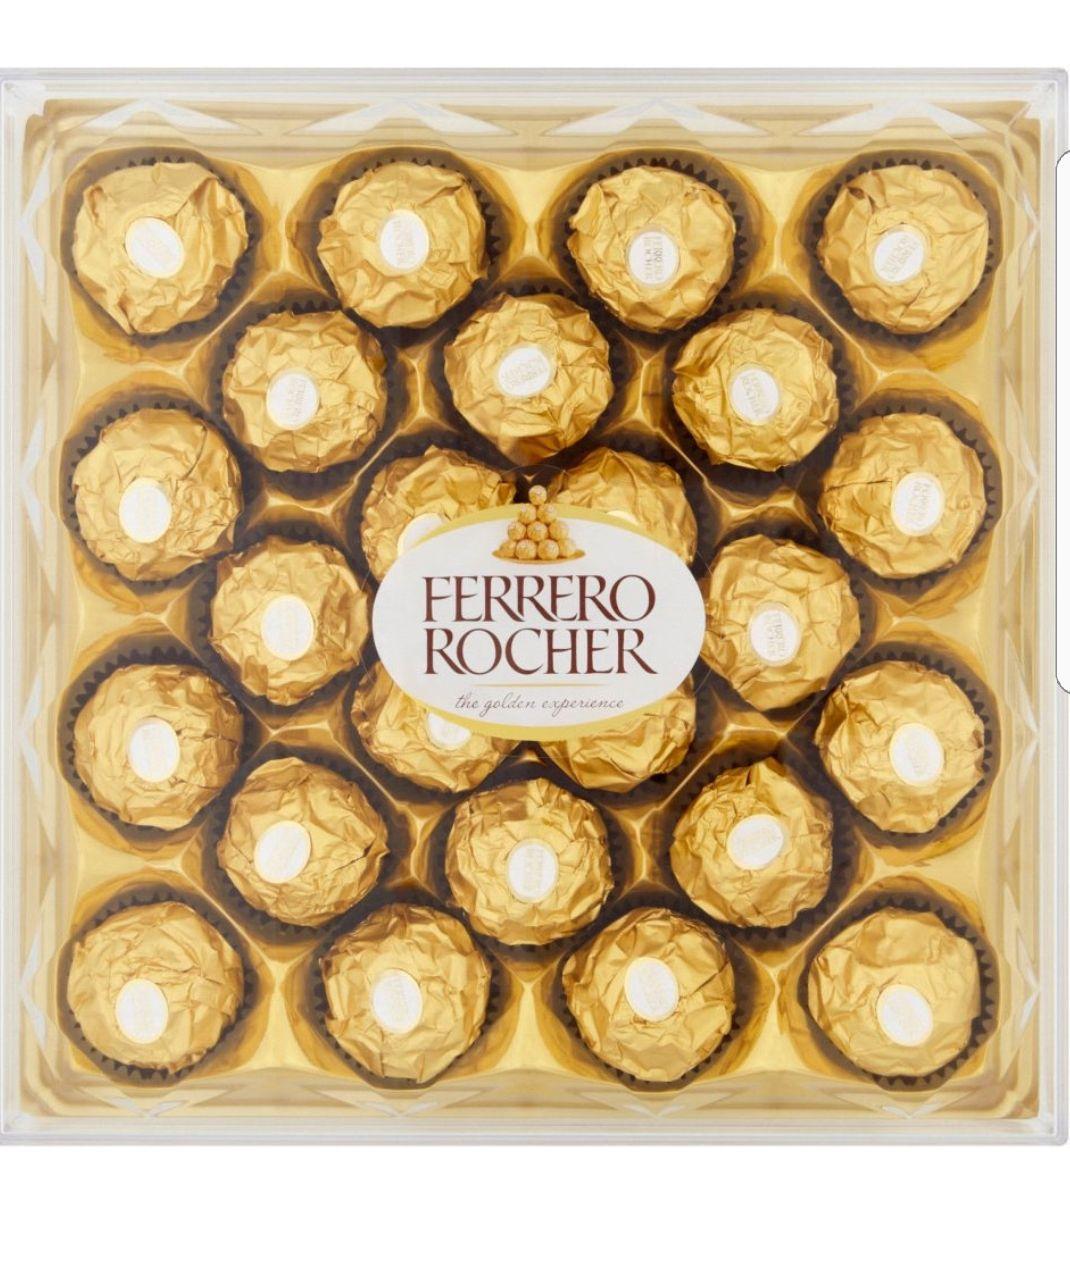 Ferrero Rocher (24 Pack) £5.50 @ Tesco